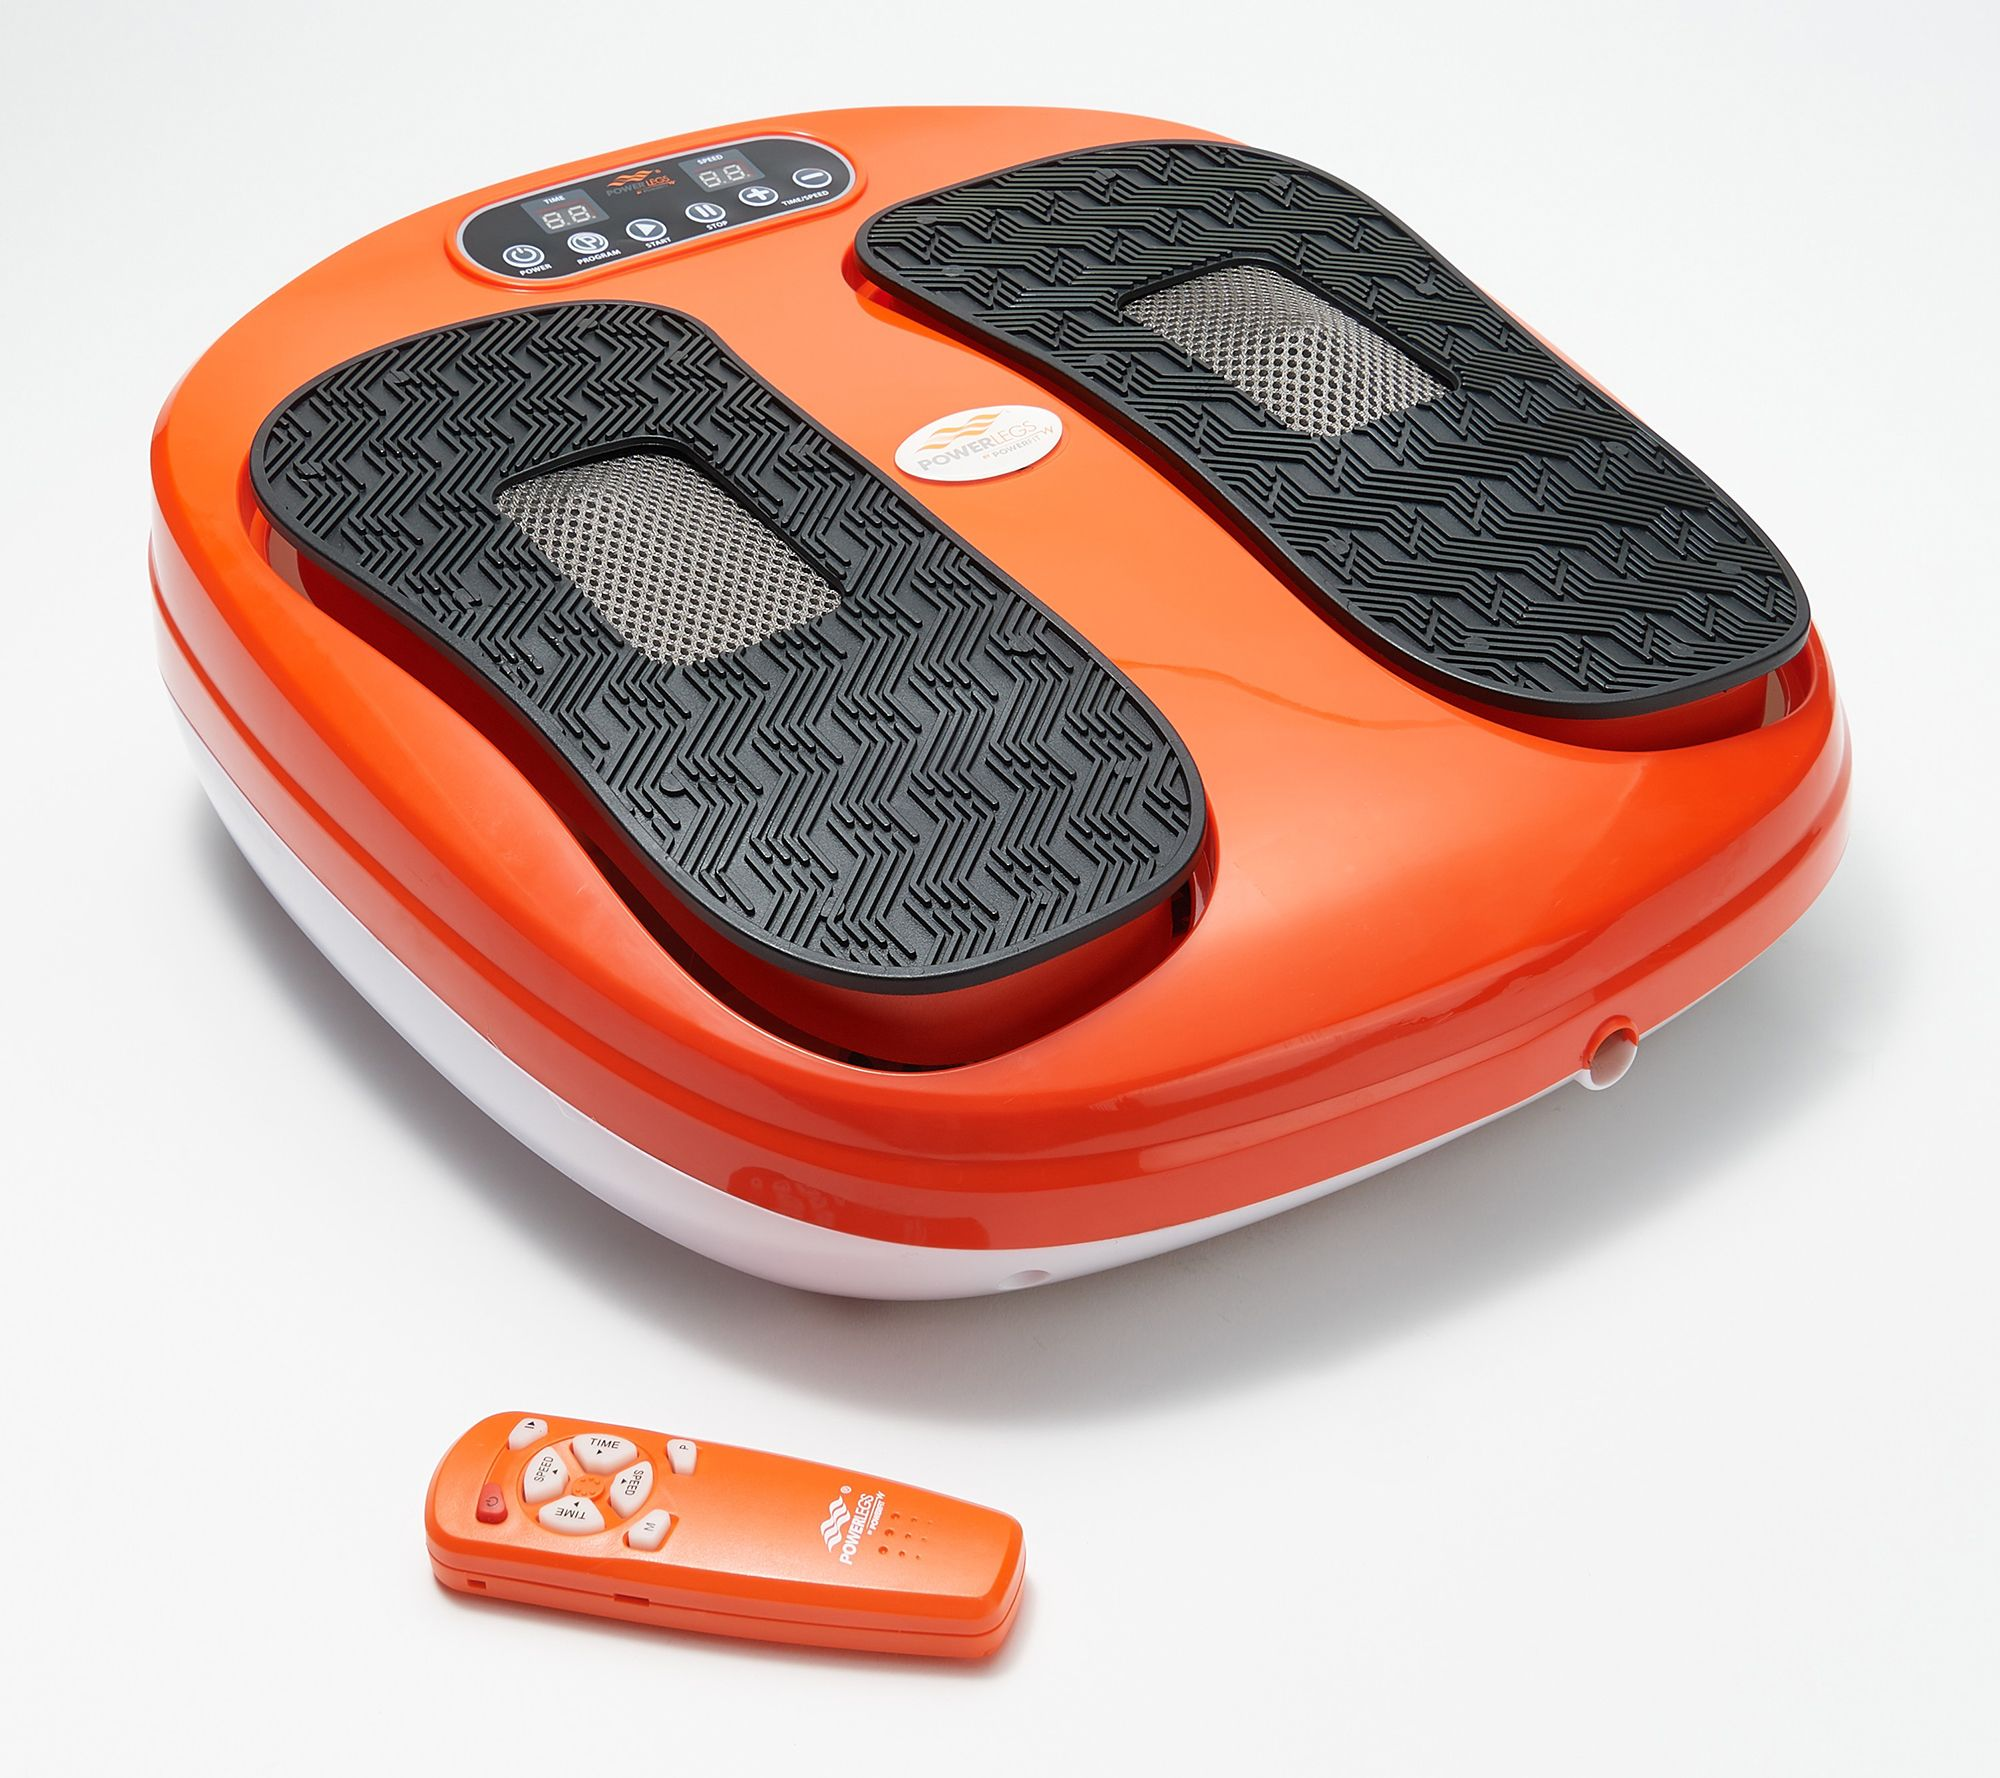 Power Legs Vibrating Foot Massager Platform w/ Acupressure